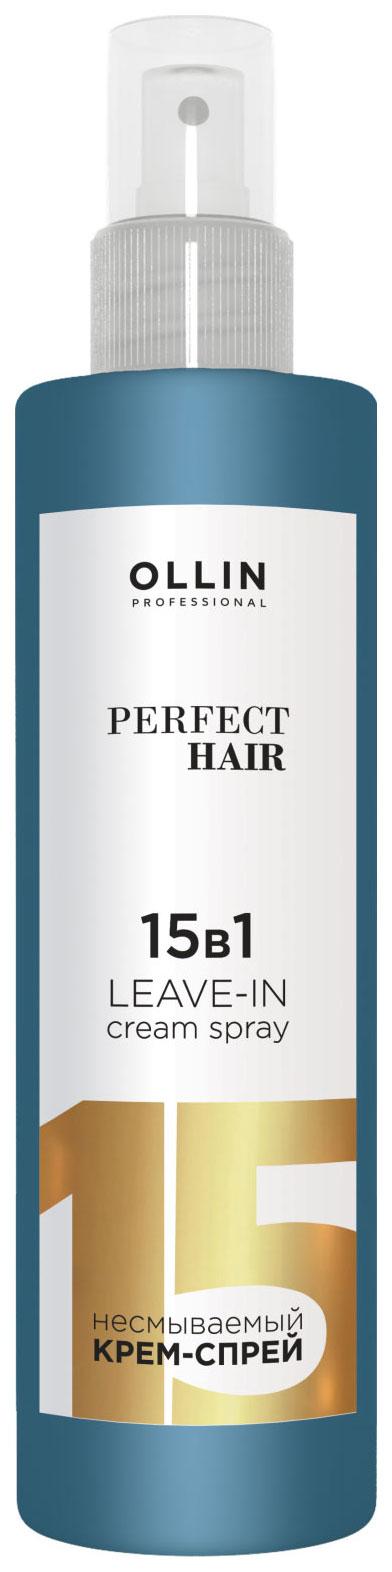 Фотография Спрей для волос Ollin Professional Perfect Hair Leave-In 250 мл №1